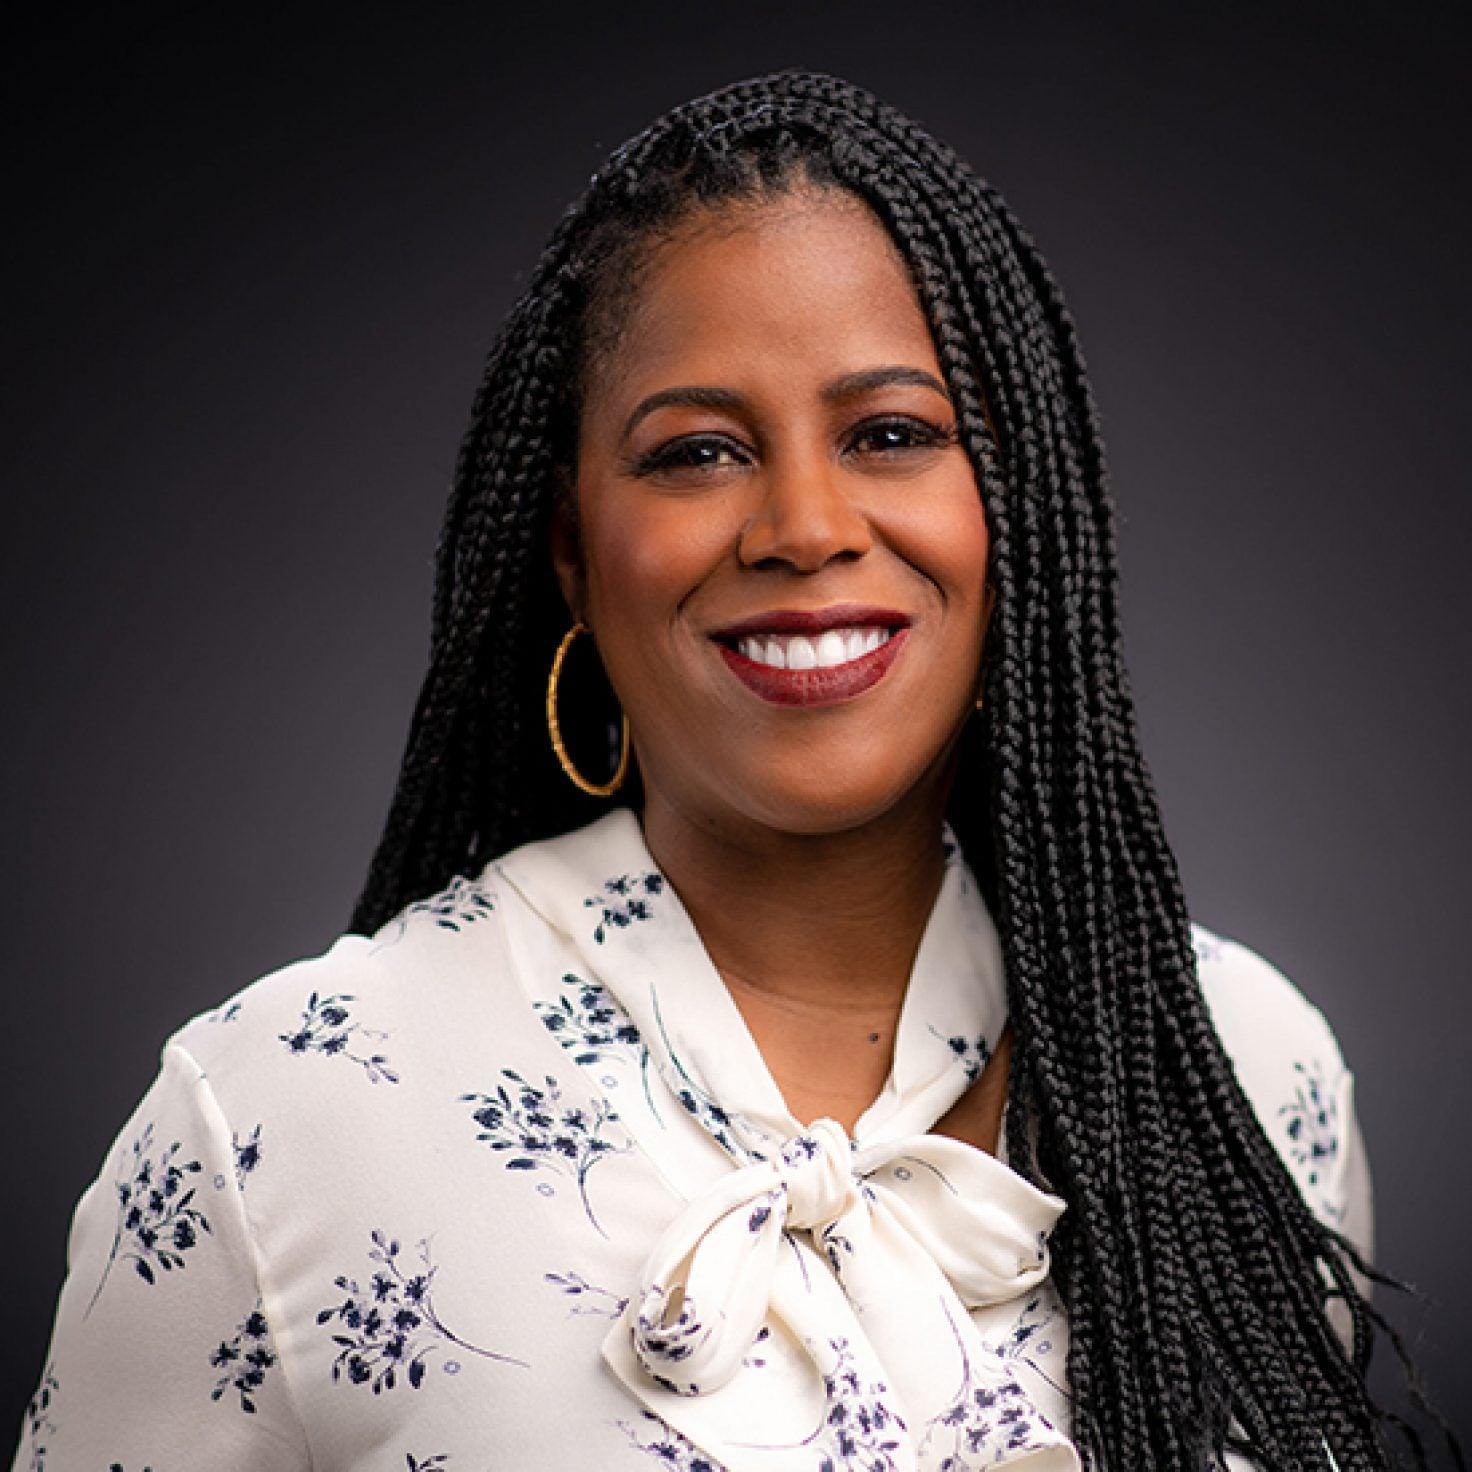 Thasunda Duckett Named First Black Woman On JPMorgan Operating Committee